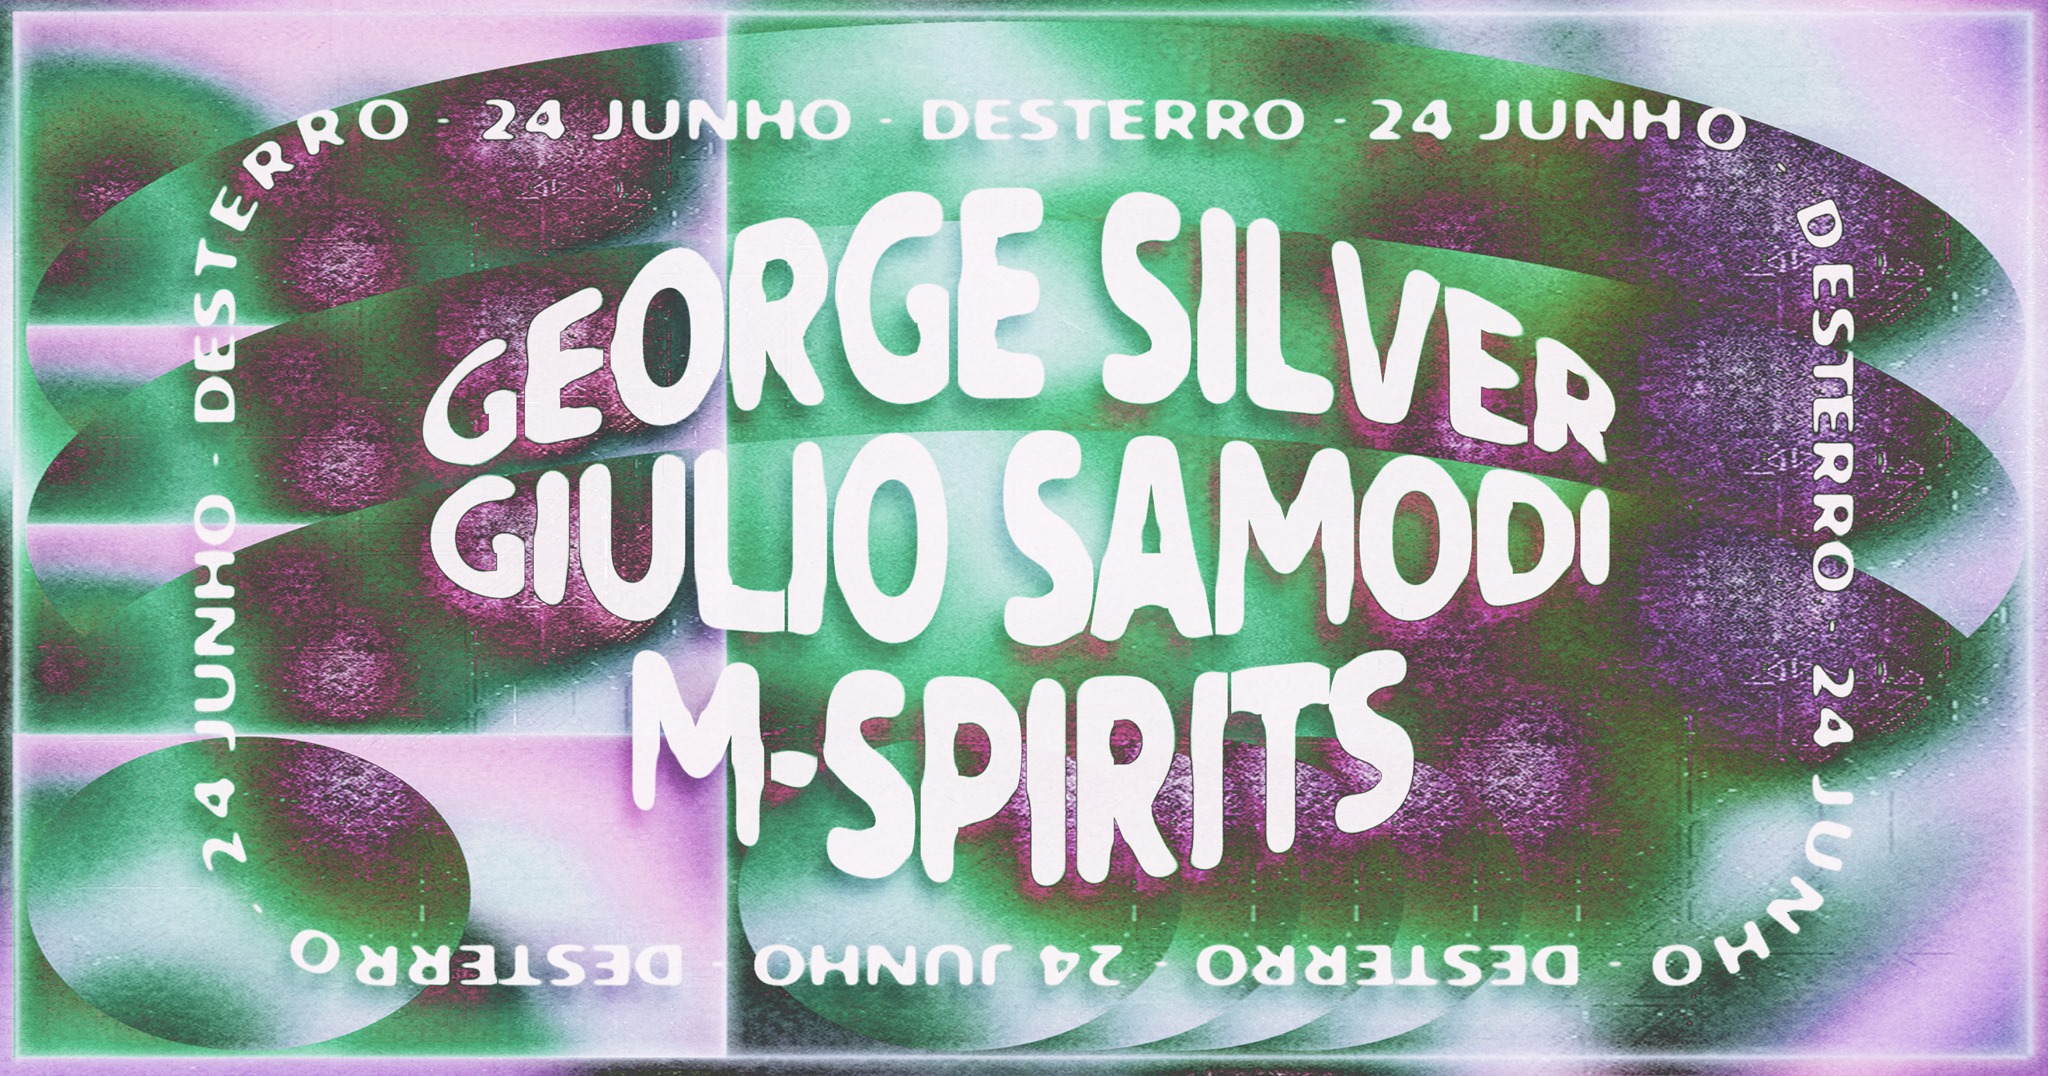 Giulio Samodi // George Silver // M-Spirits